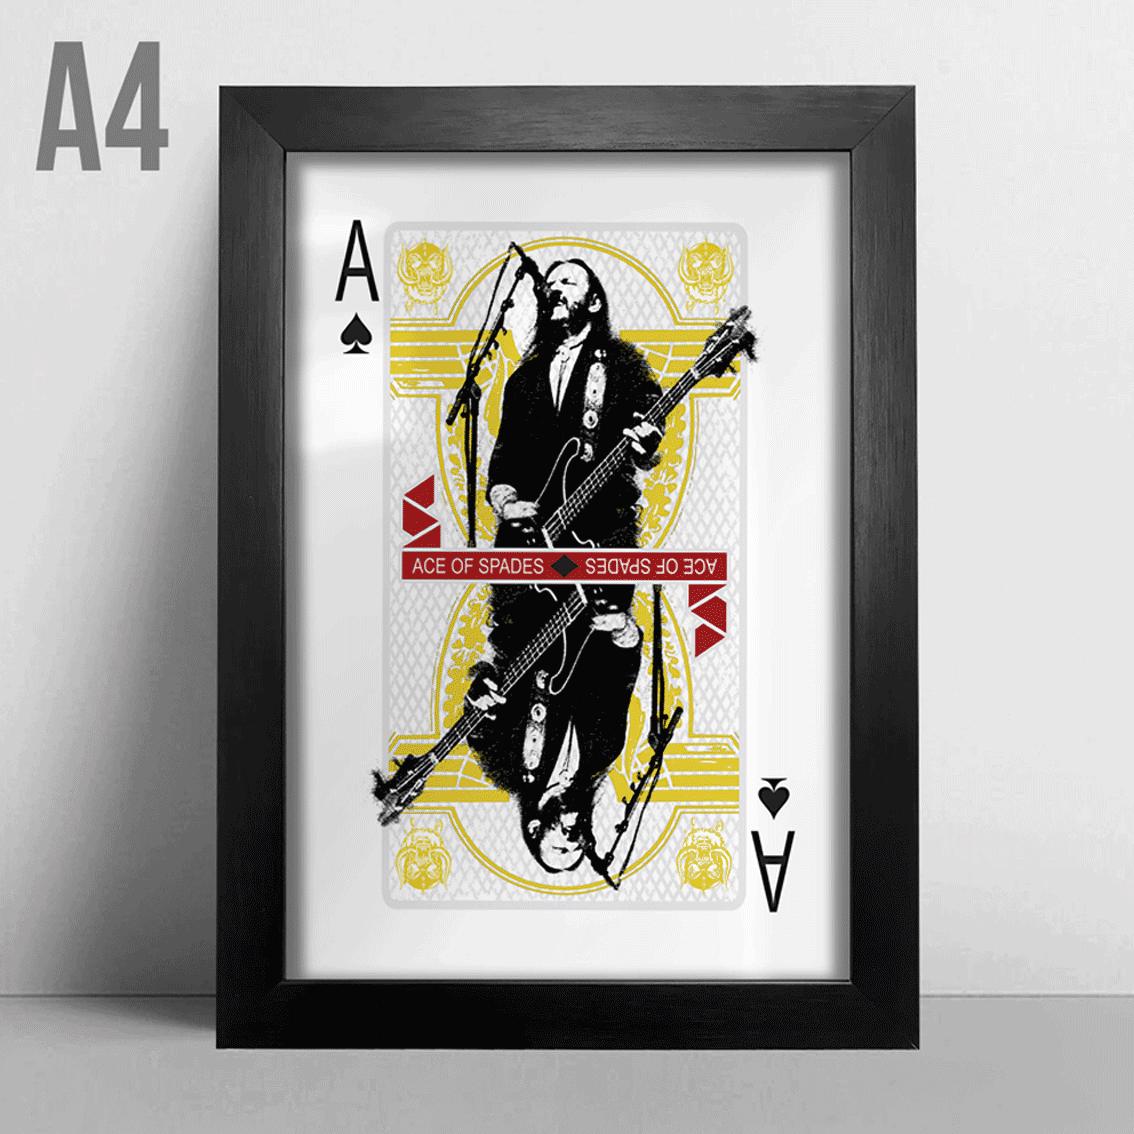 Quadro A4 - Ace of Spades